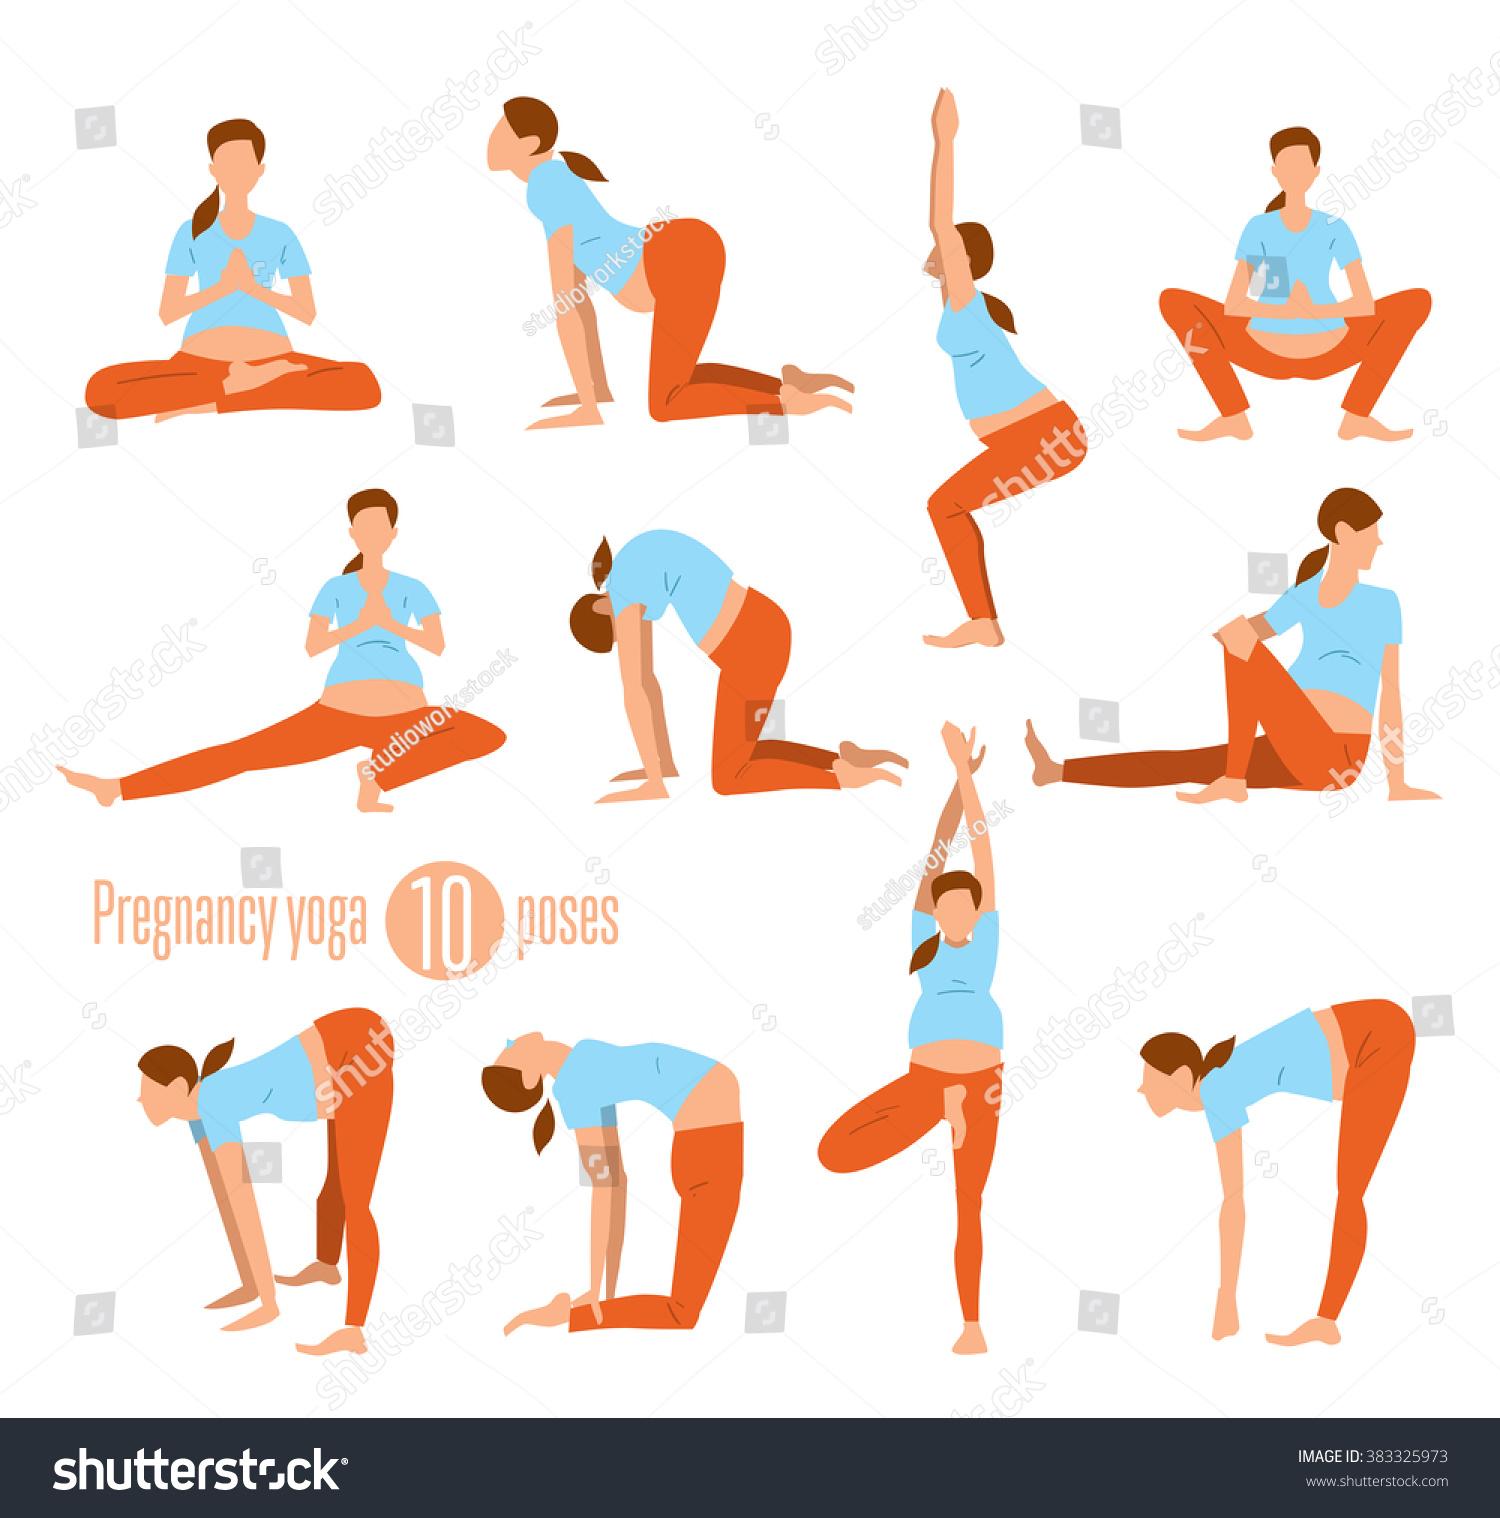 Pregnancy Yoga Yoga Pregnant Women Yoga Stock Vector ...